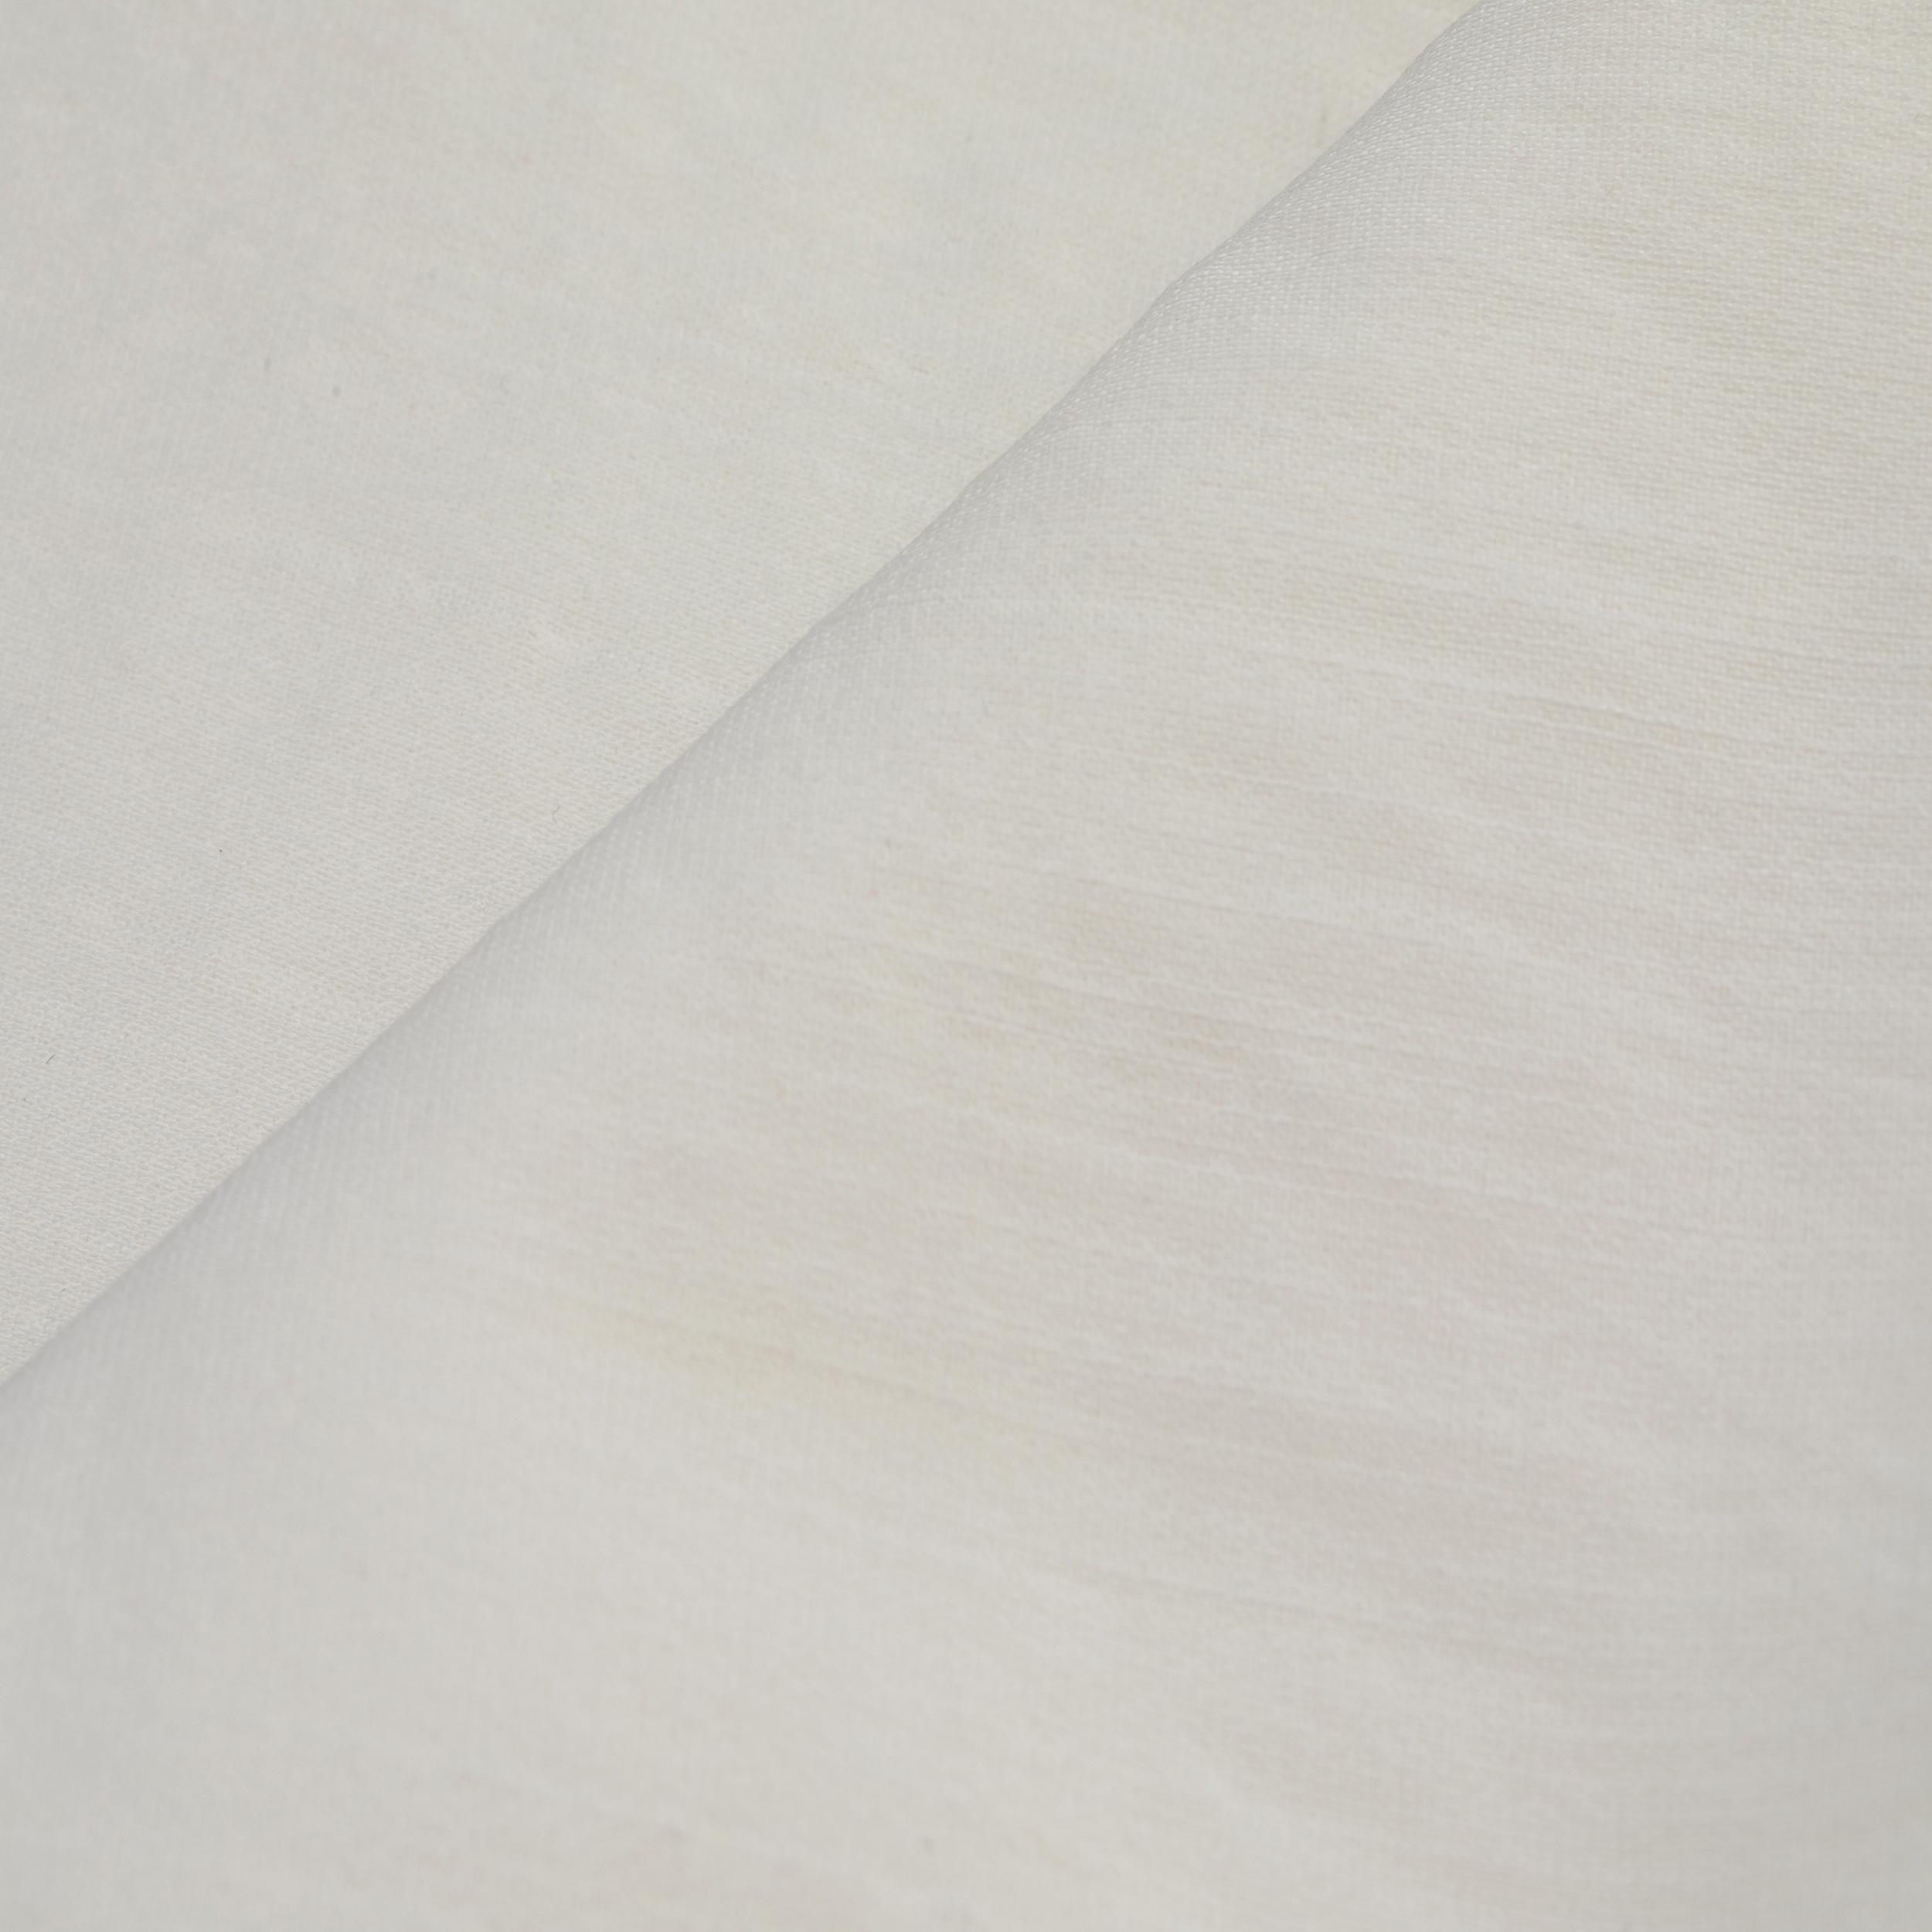 rayon slub polyester grey 75D t400 fabric plain weave garment